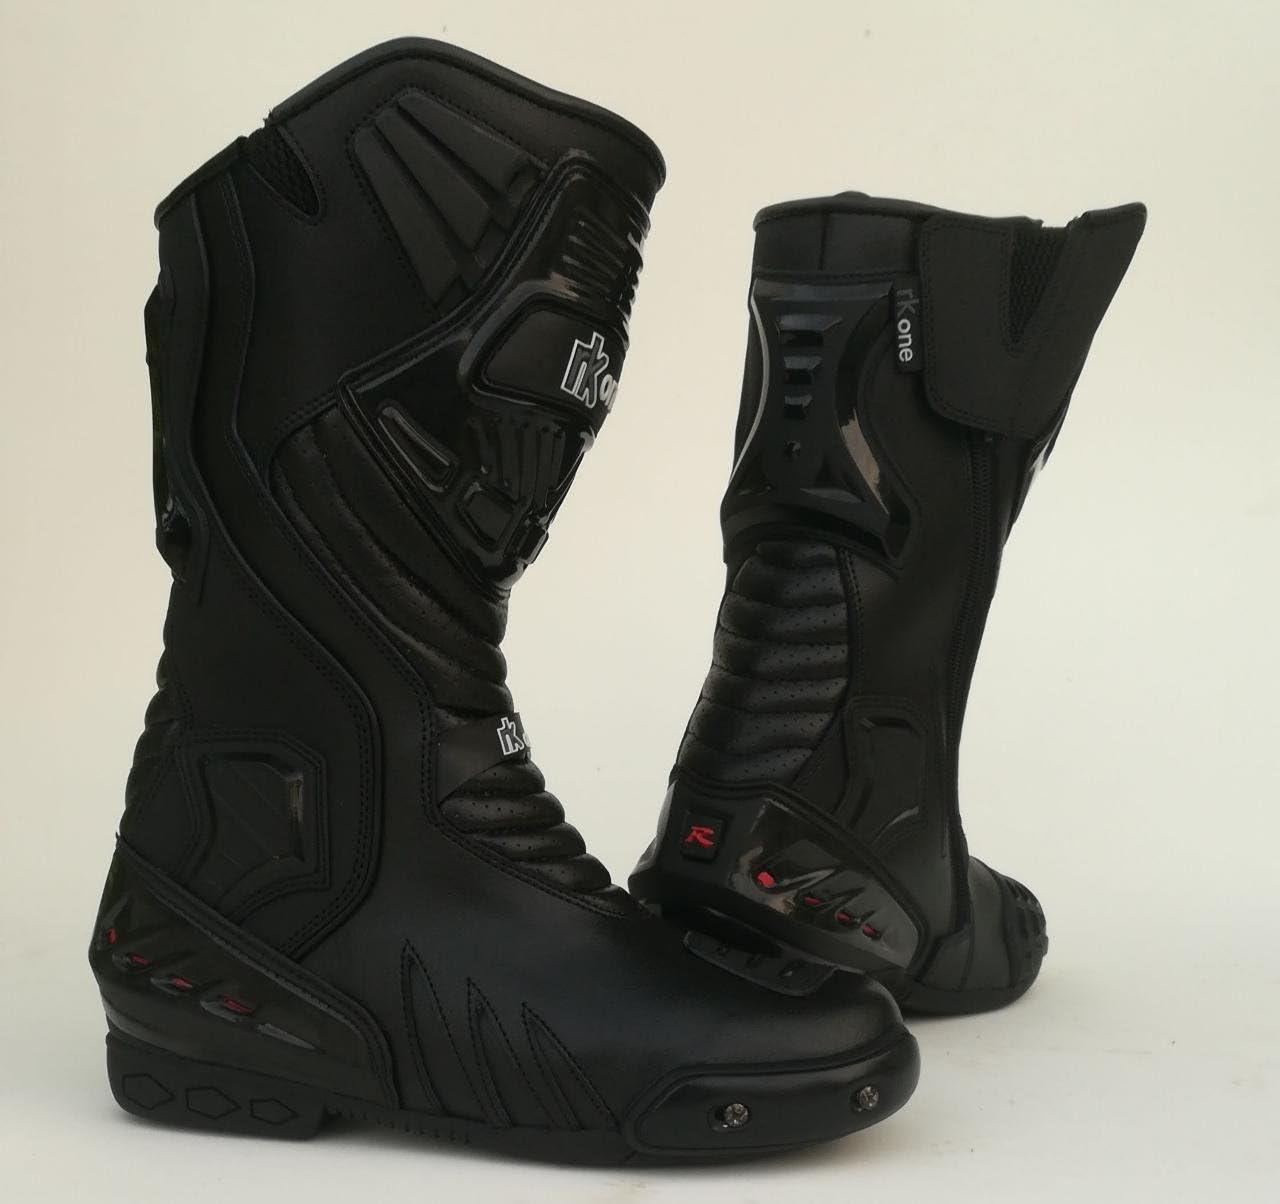 RKsports RKone Racer Waterproof Motorbike Motorcycle Boots Black